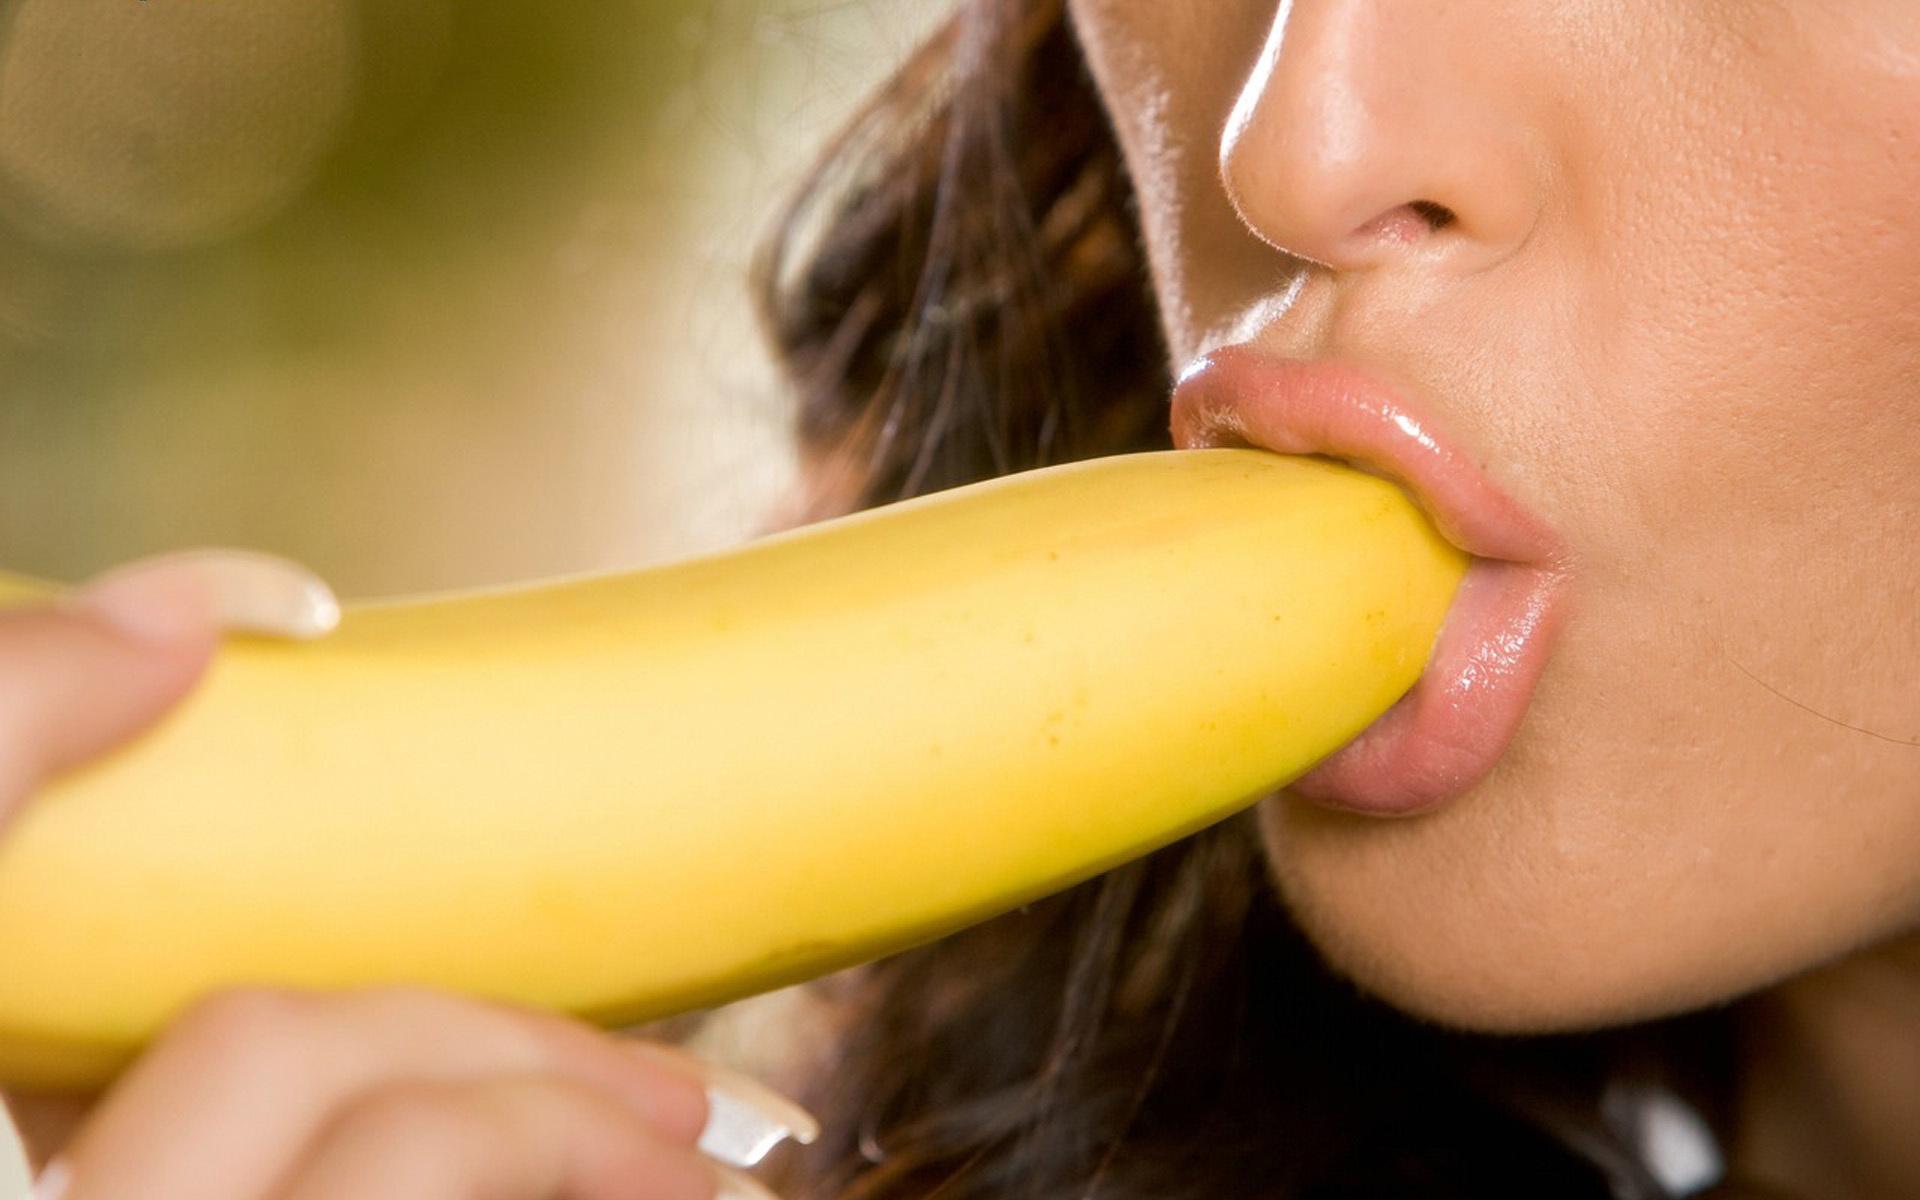 эротика девушки с бананом